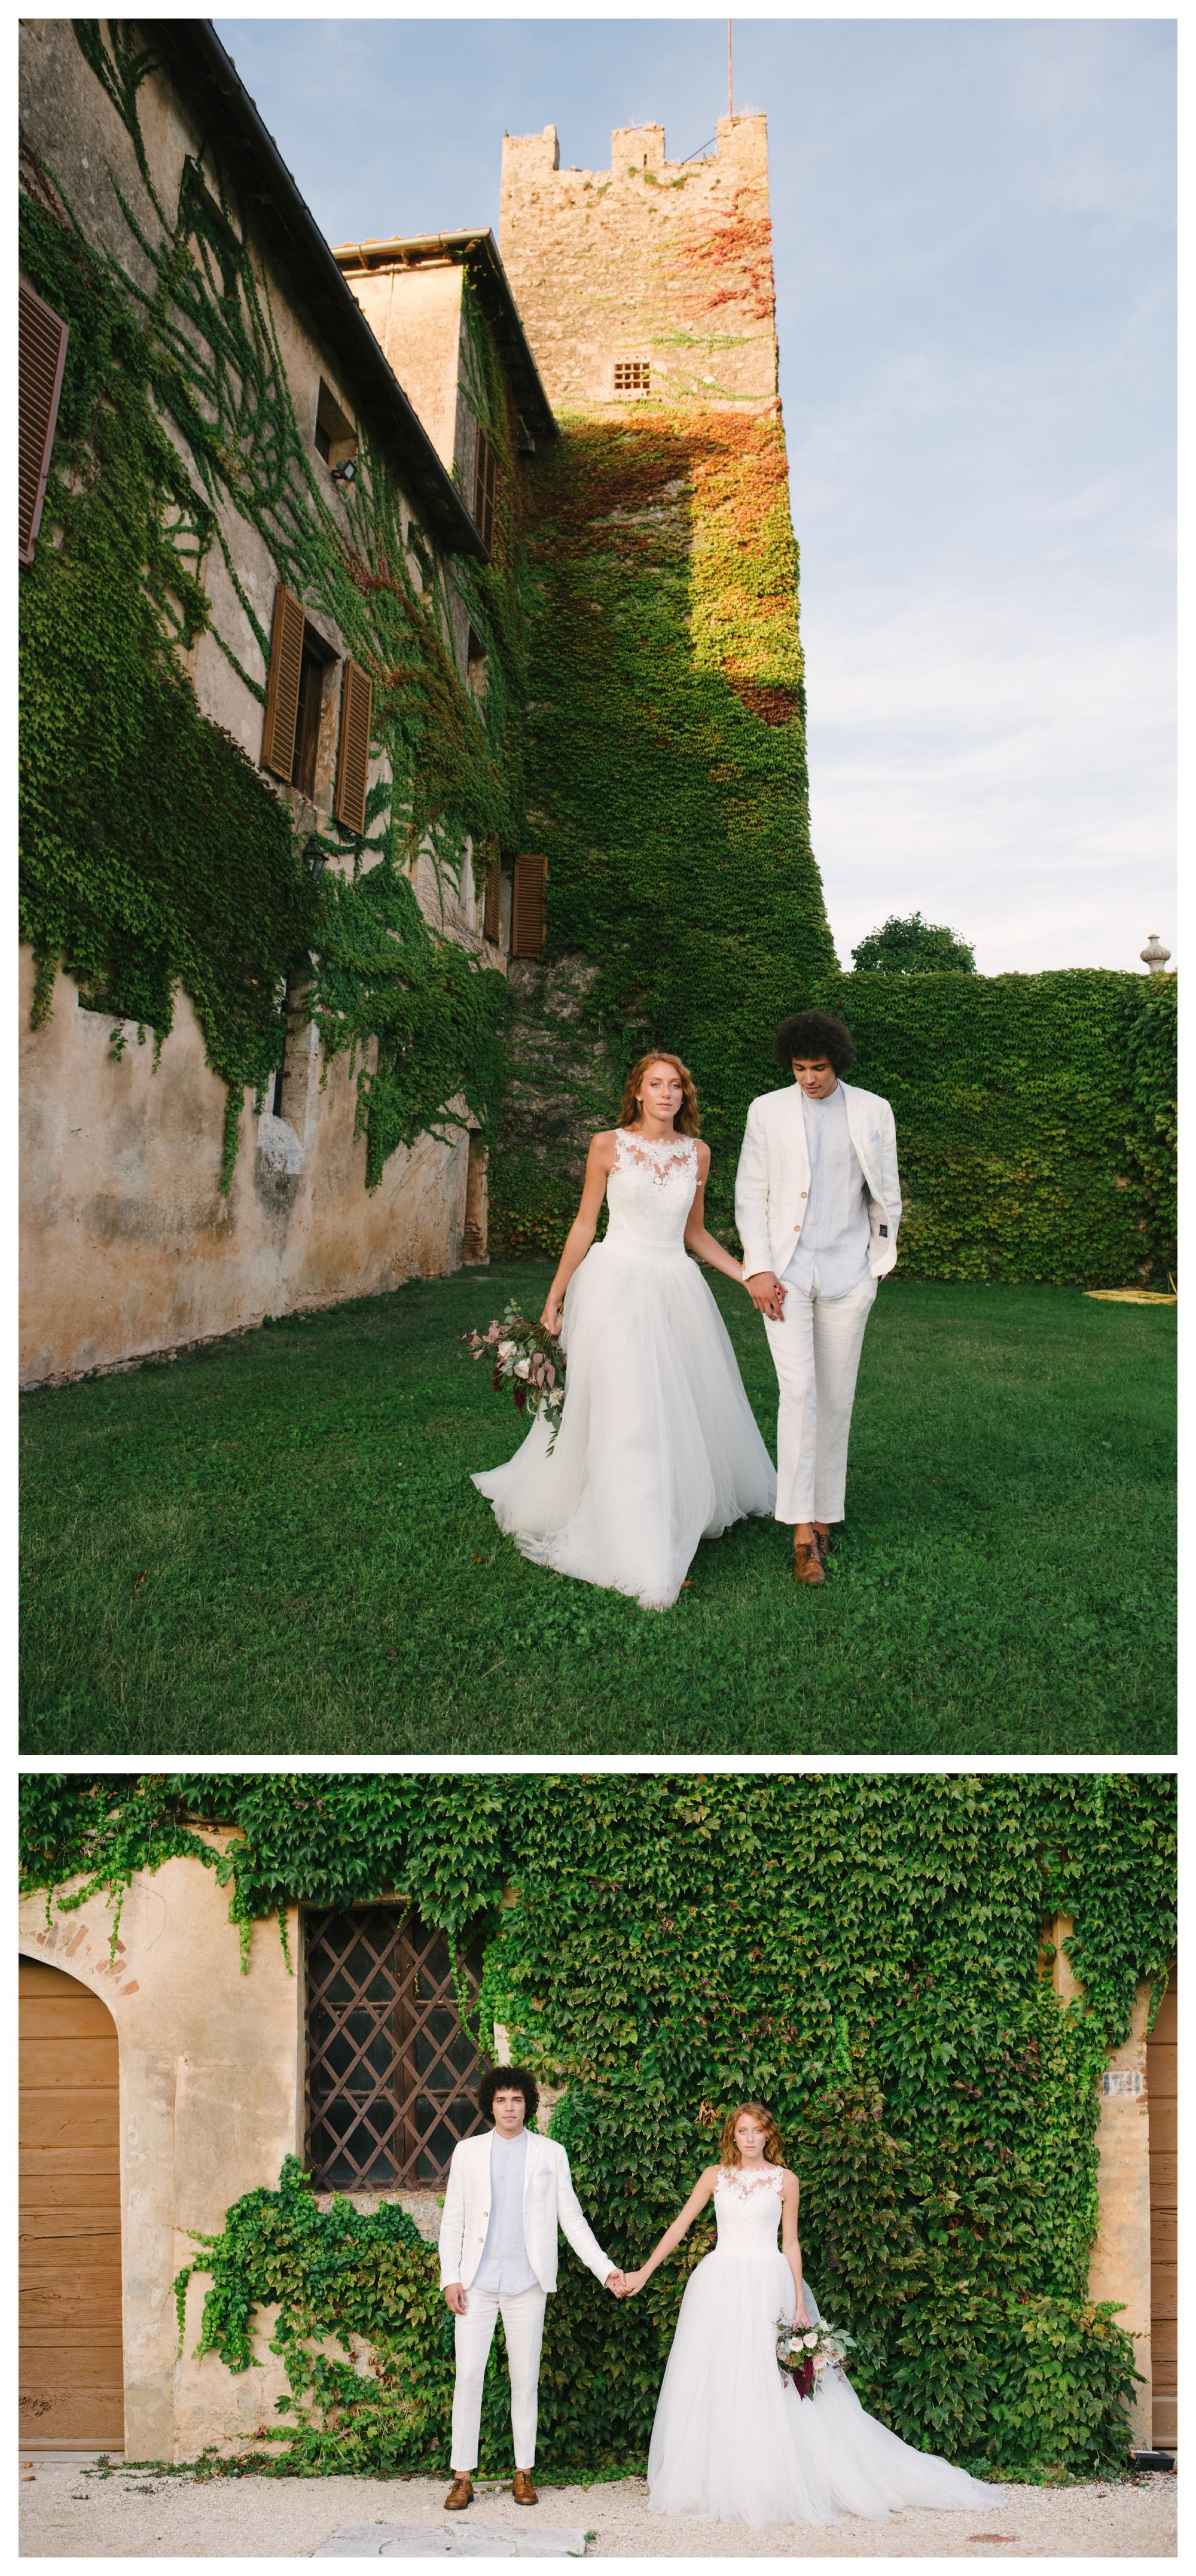 tuscany-castle-wedding-photographer-italy-williamsburgphotostudios-_0024.jpg